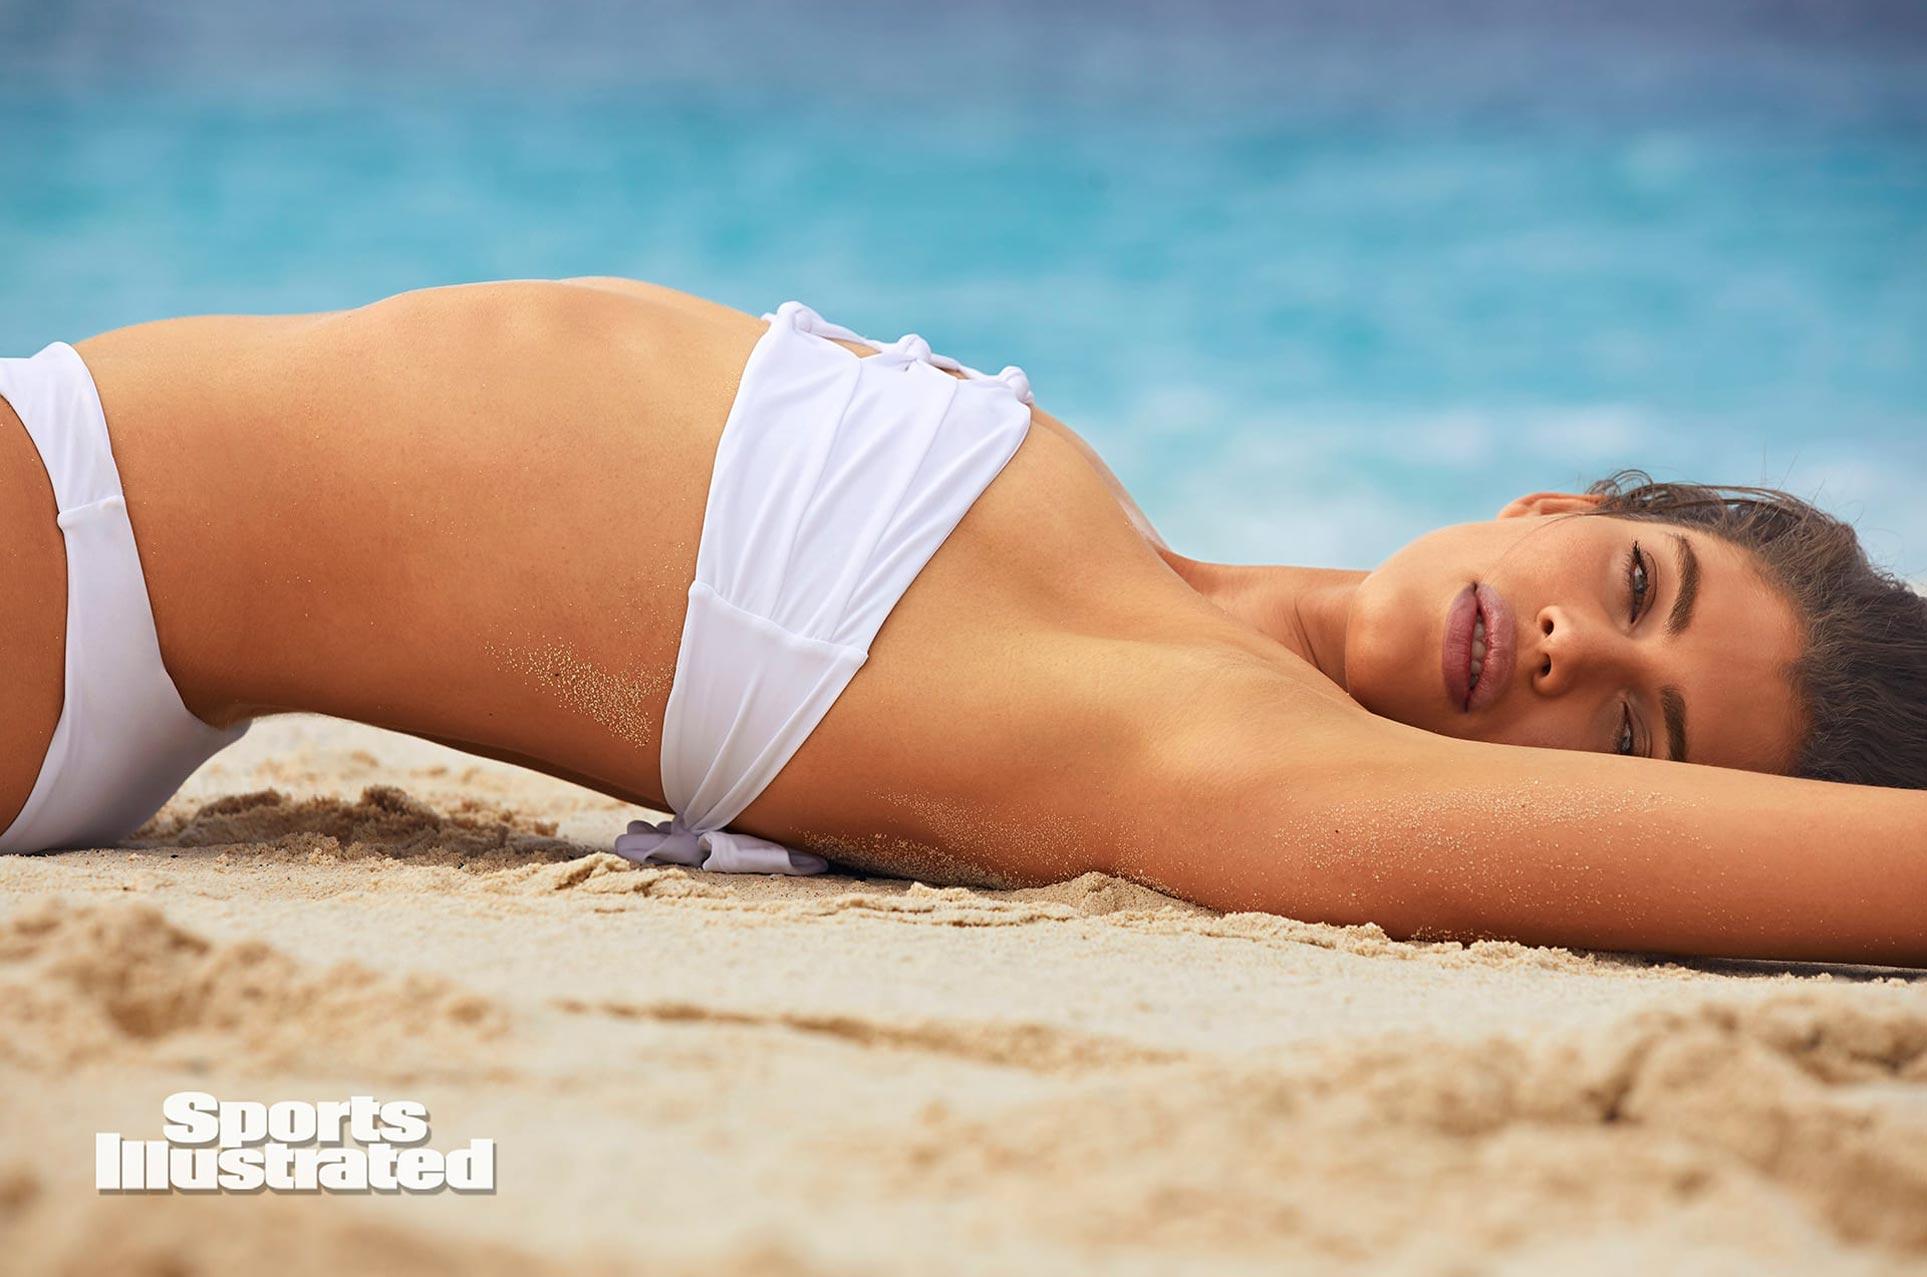 Валентина Сампайо в каталоге купальников Sports Illustrated Swimsuit 2020 / фото 11